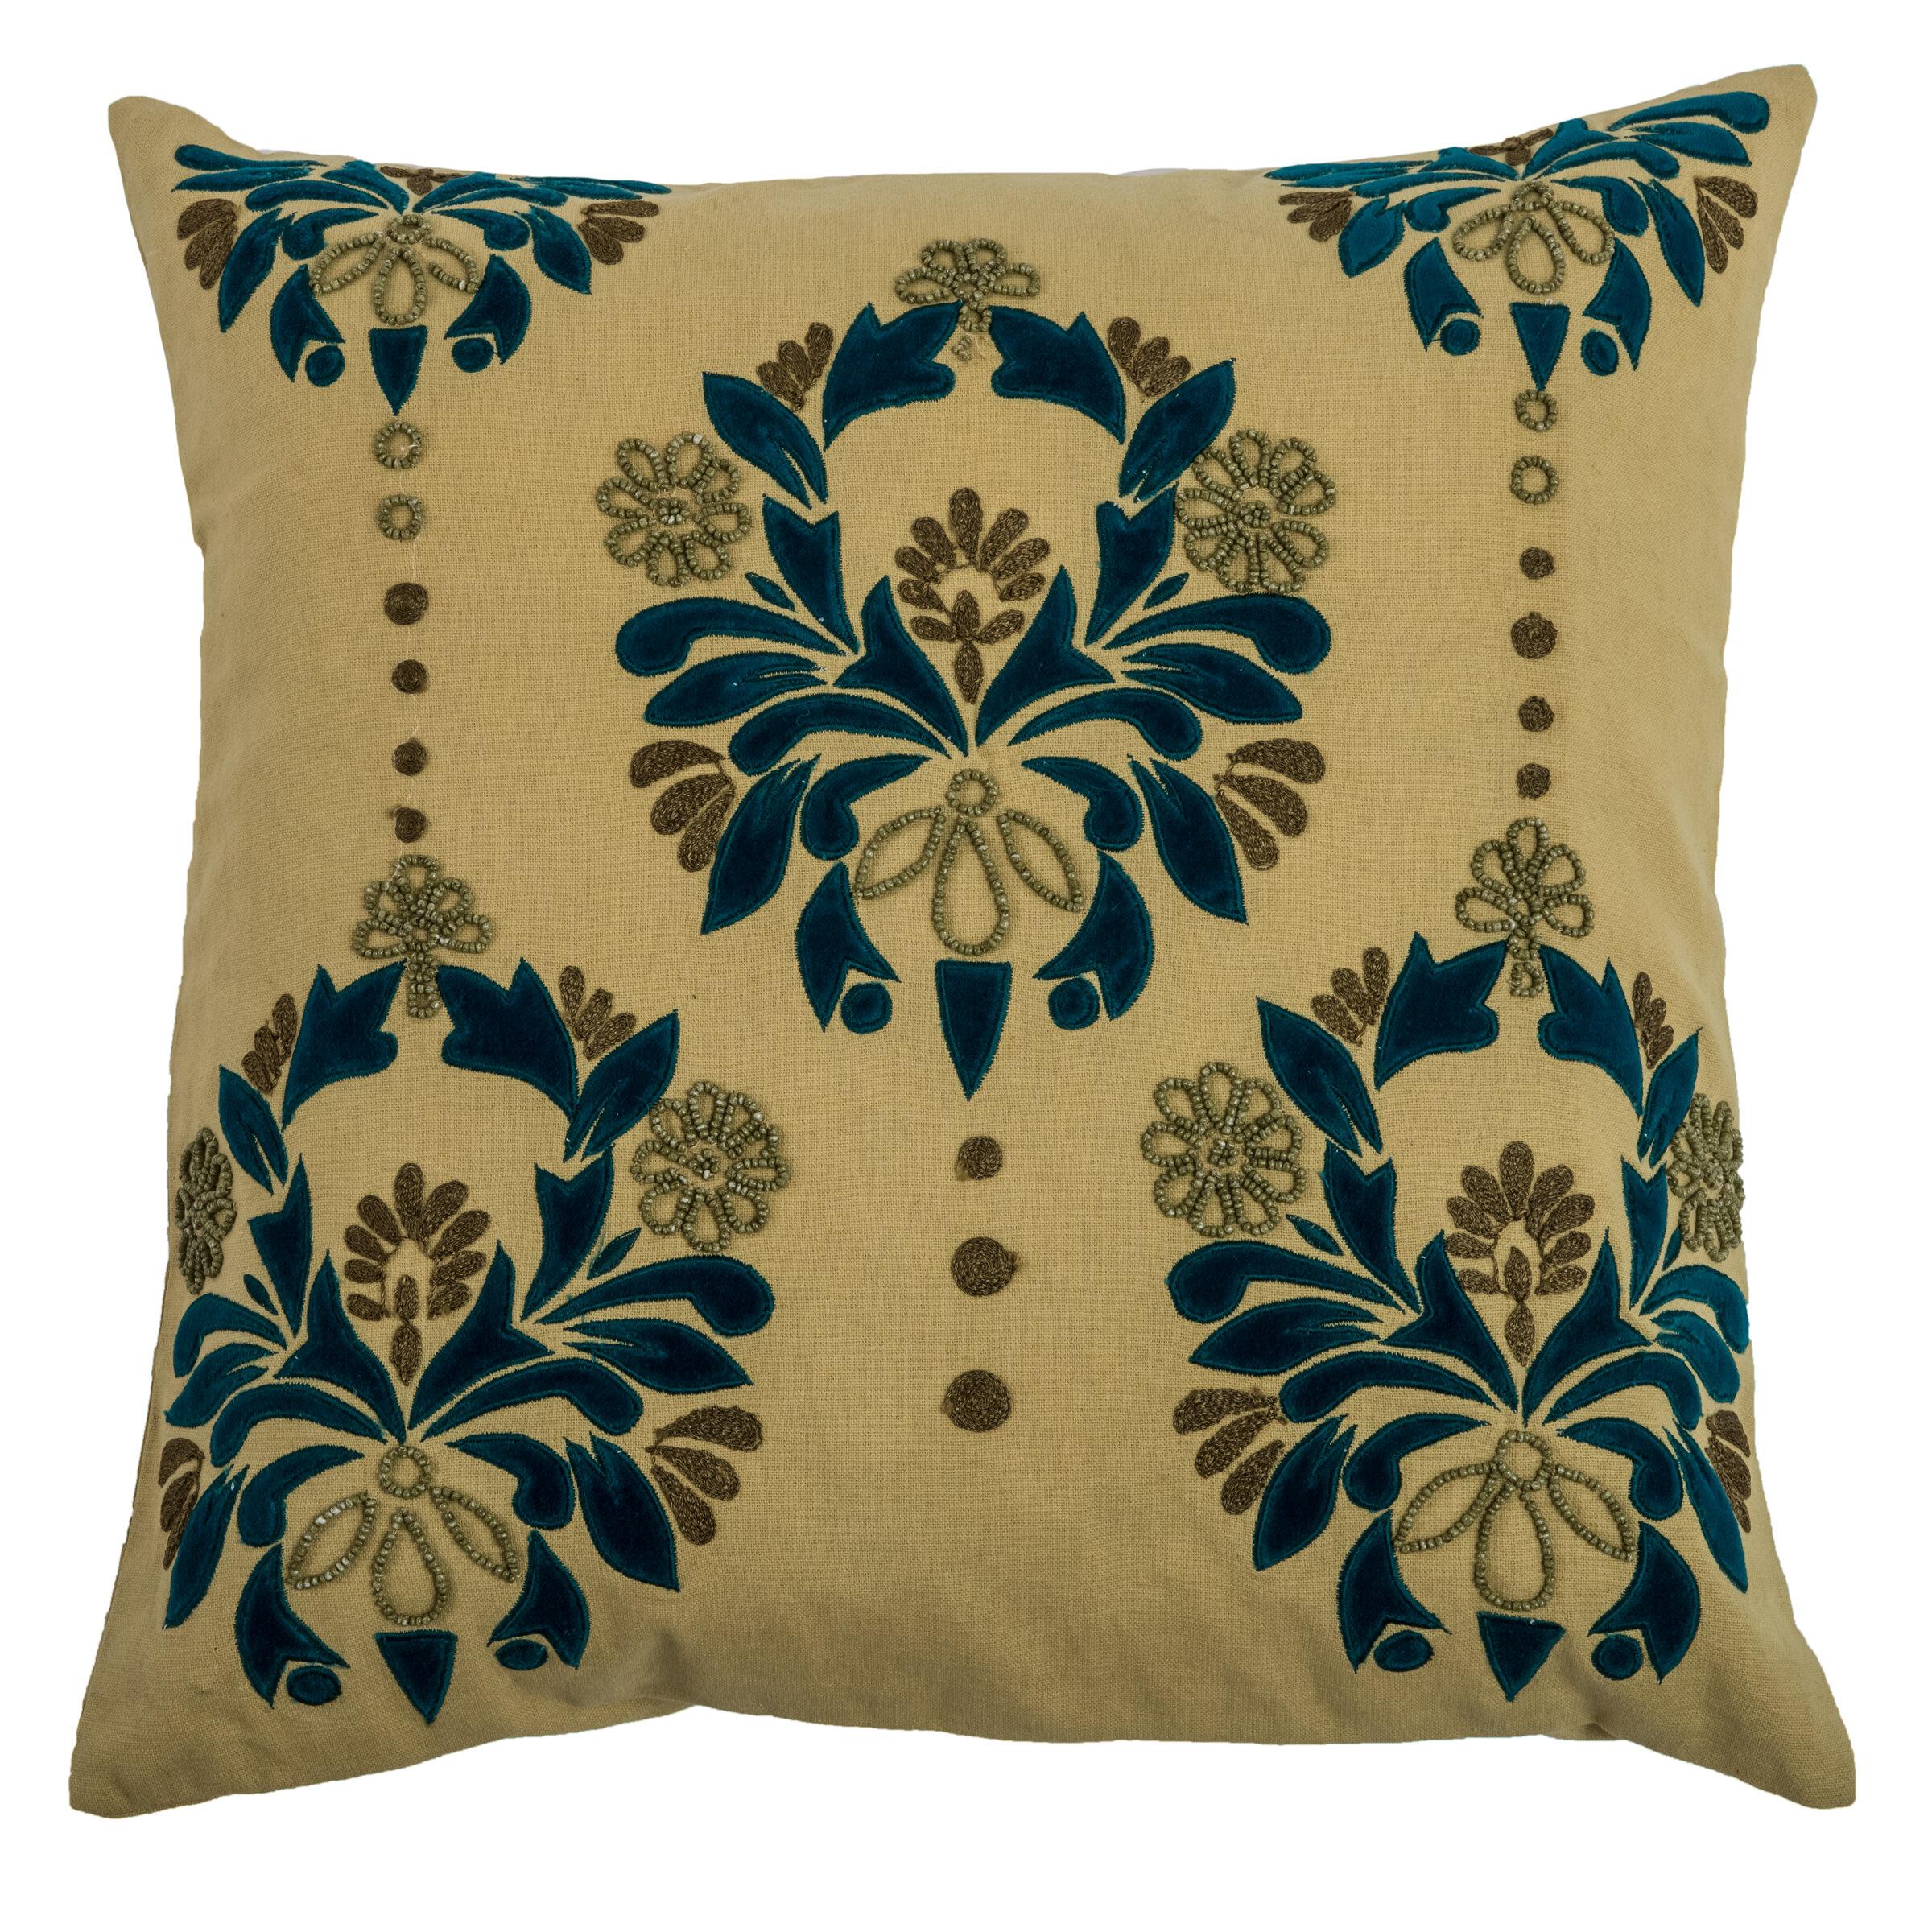 Pillow Cover Insert Wildon Home Throw Pillows You Ll Love In 2021 Wayfair